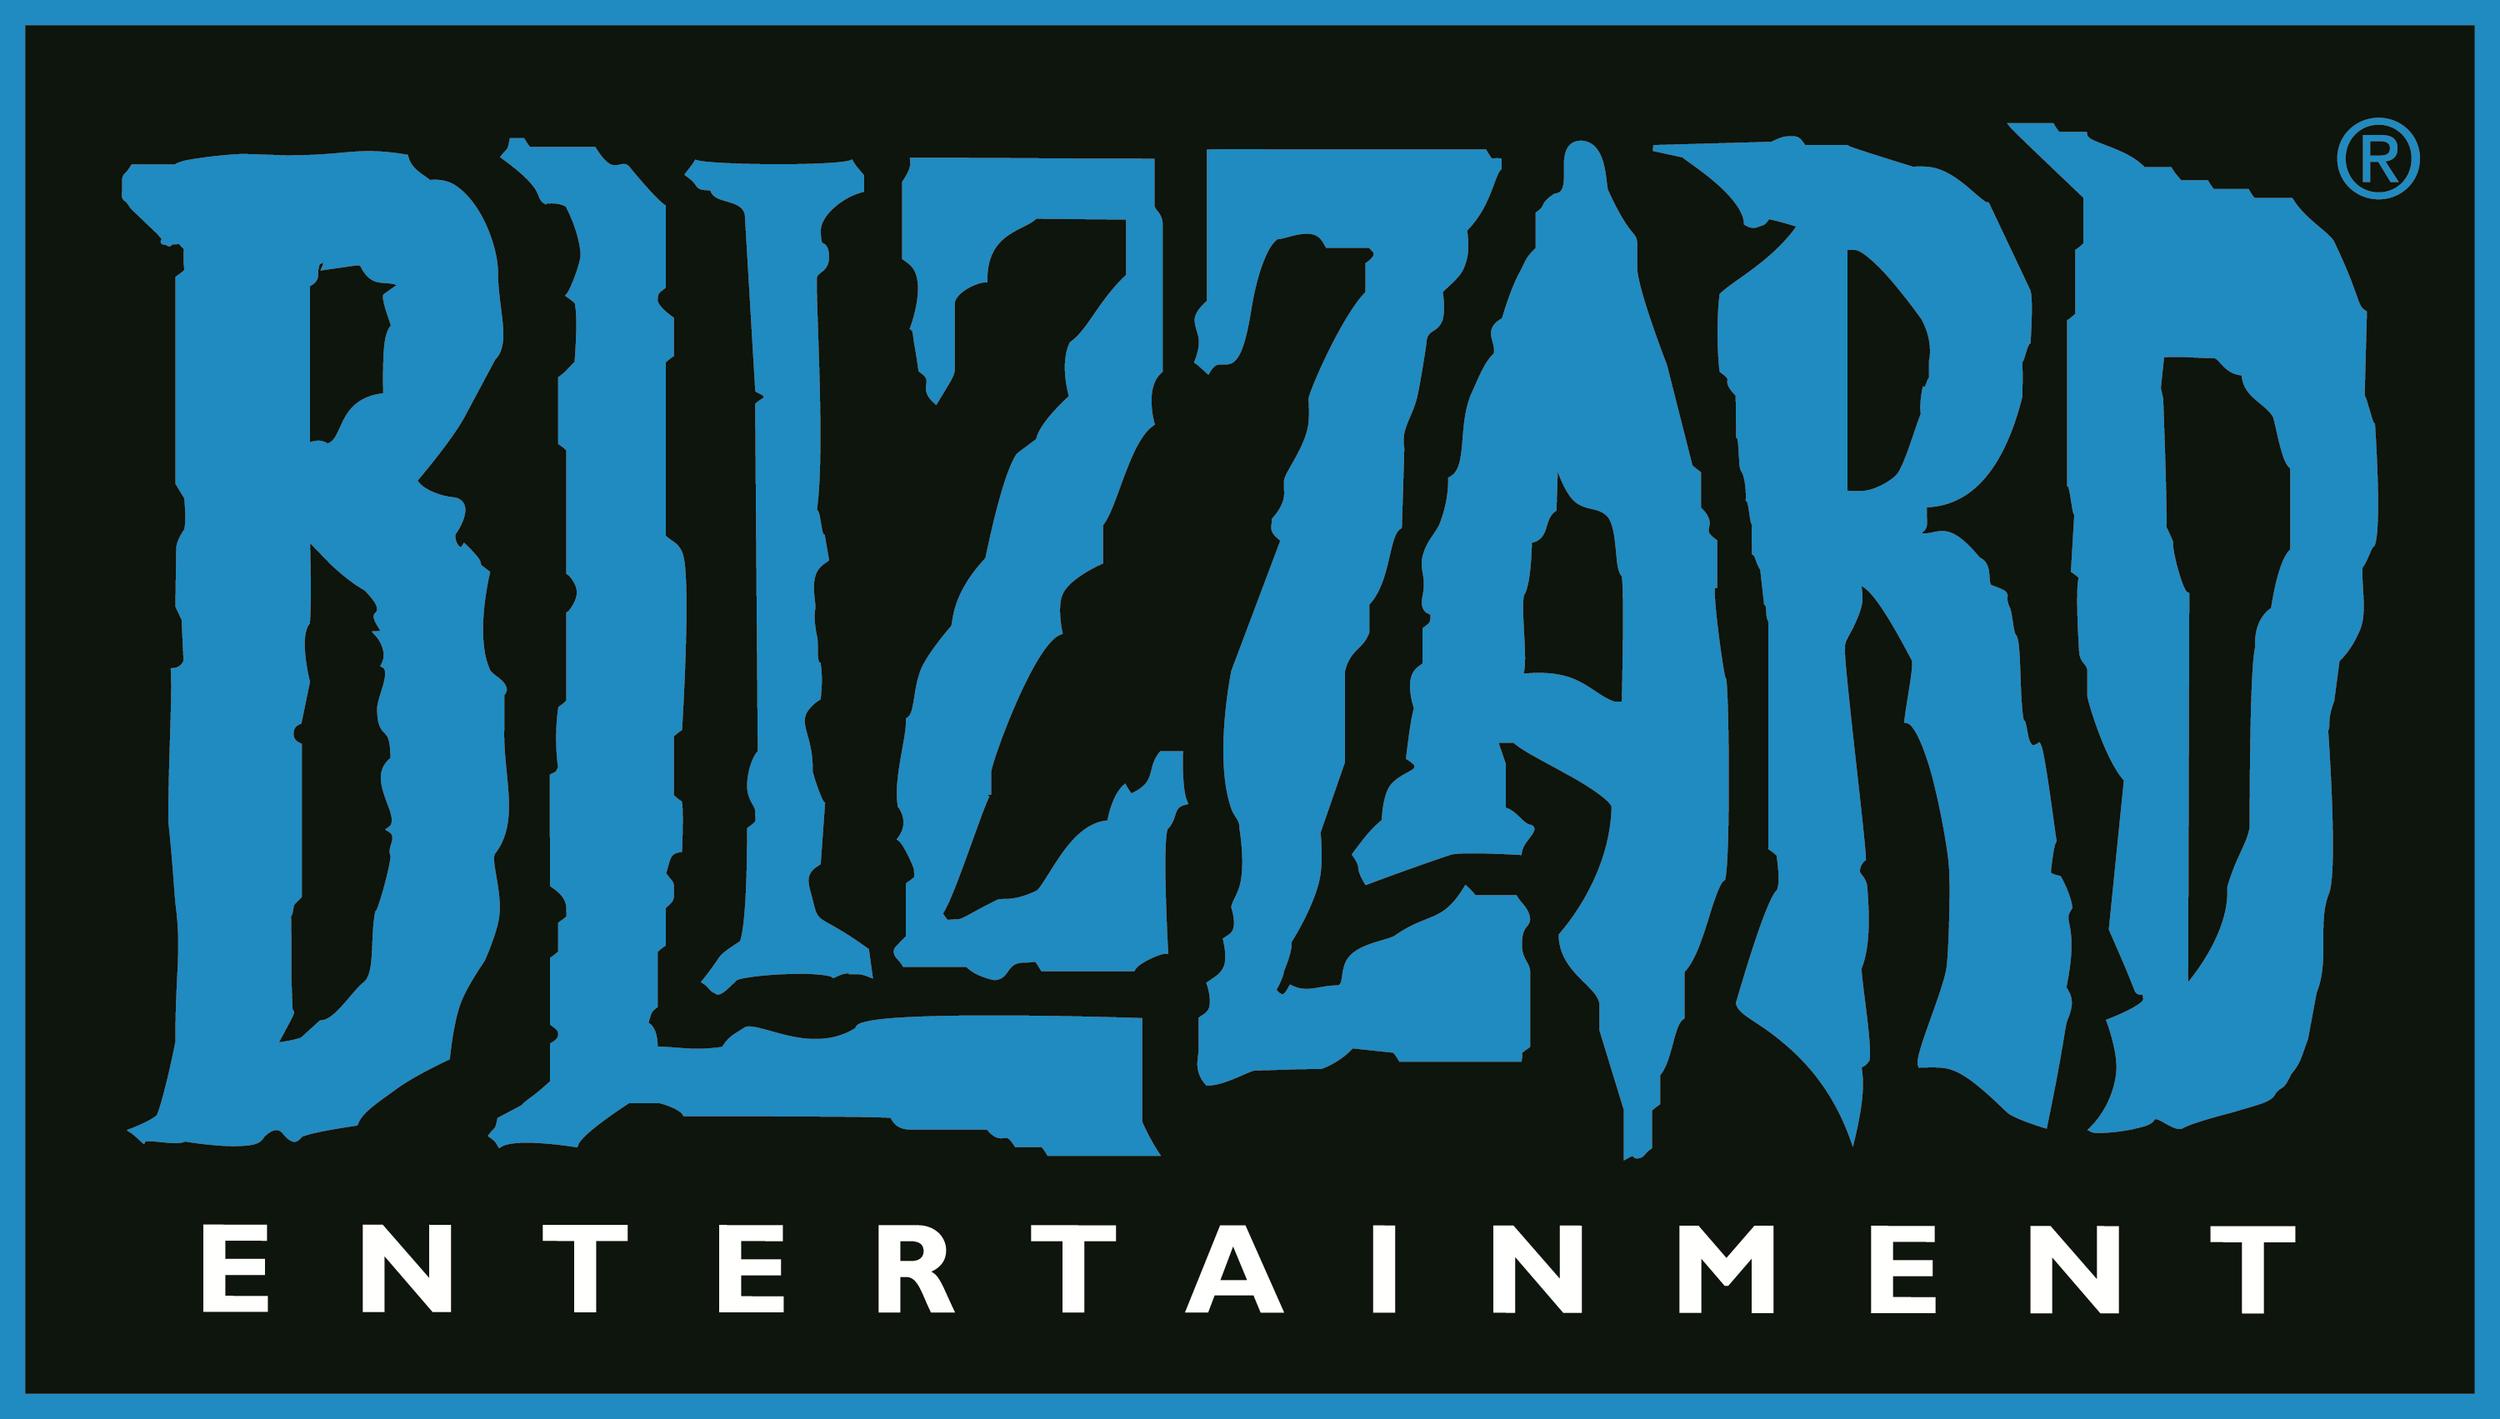 Blizzard_Entertainment_logo_blue_outline_on_black.png